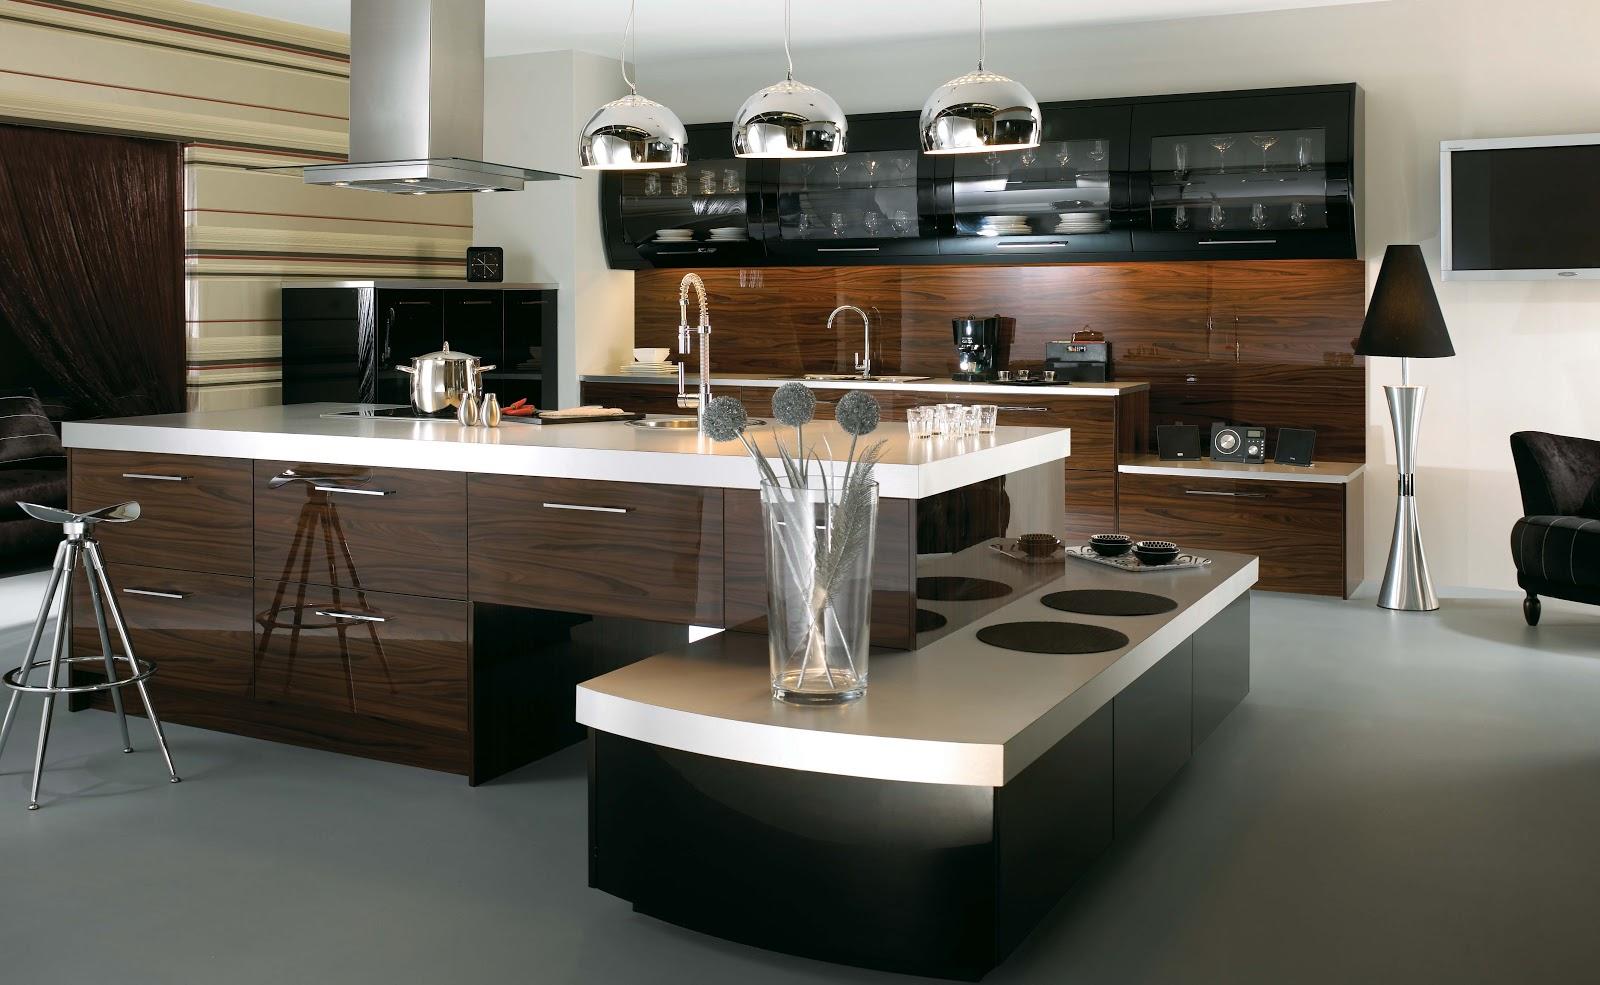 bellitudoo luksusowe kuchnie. Black Bedroom Furniture Sets. Home Design Ideas